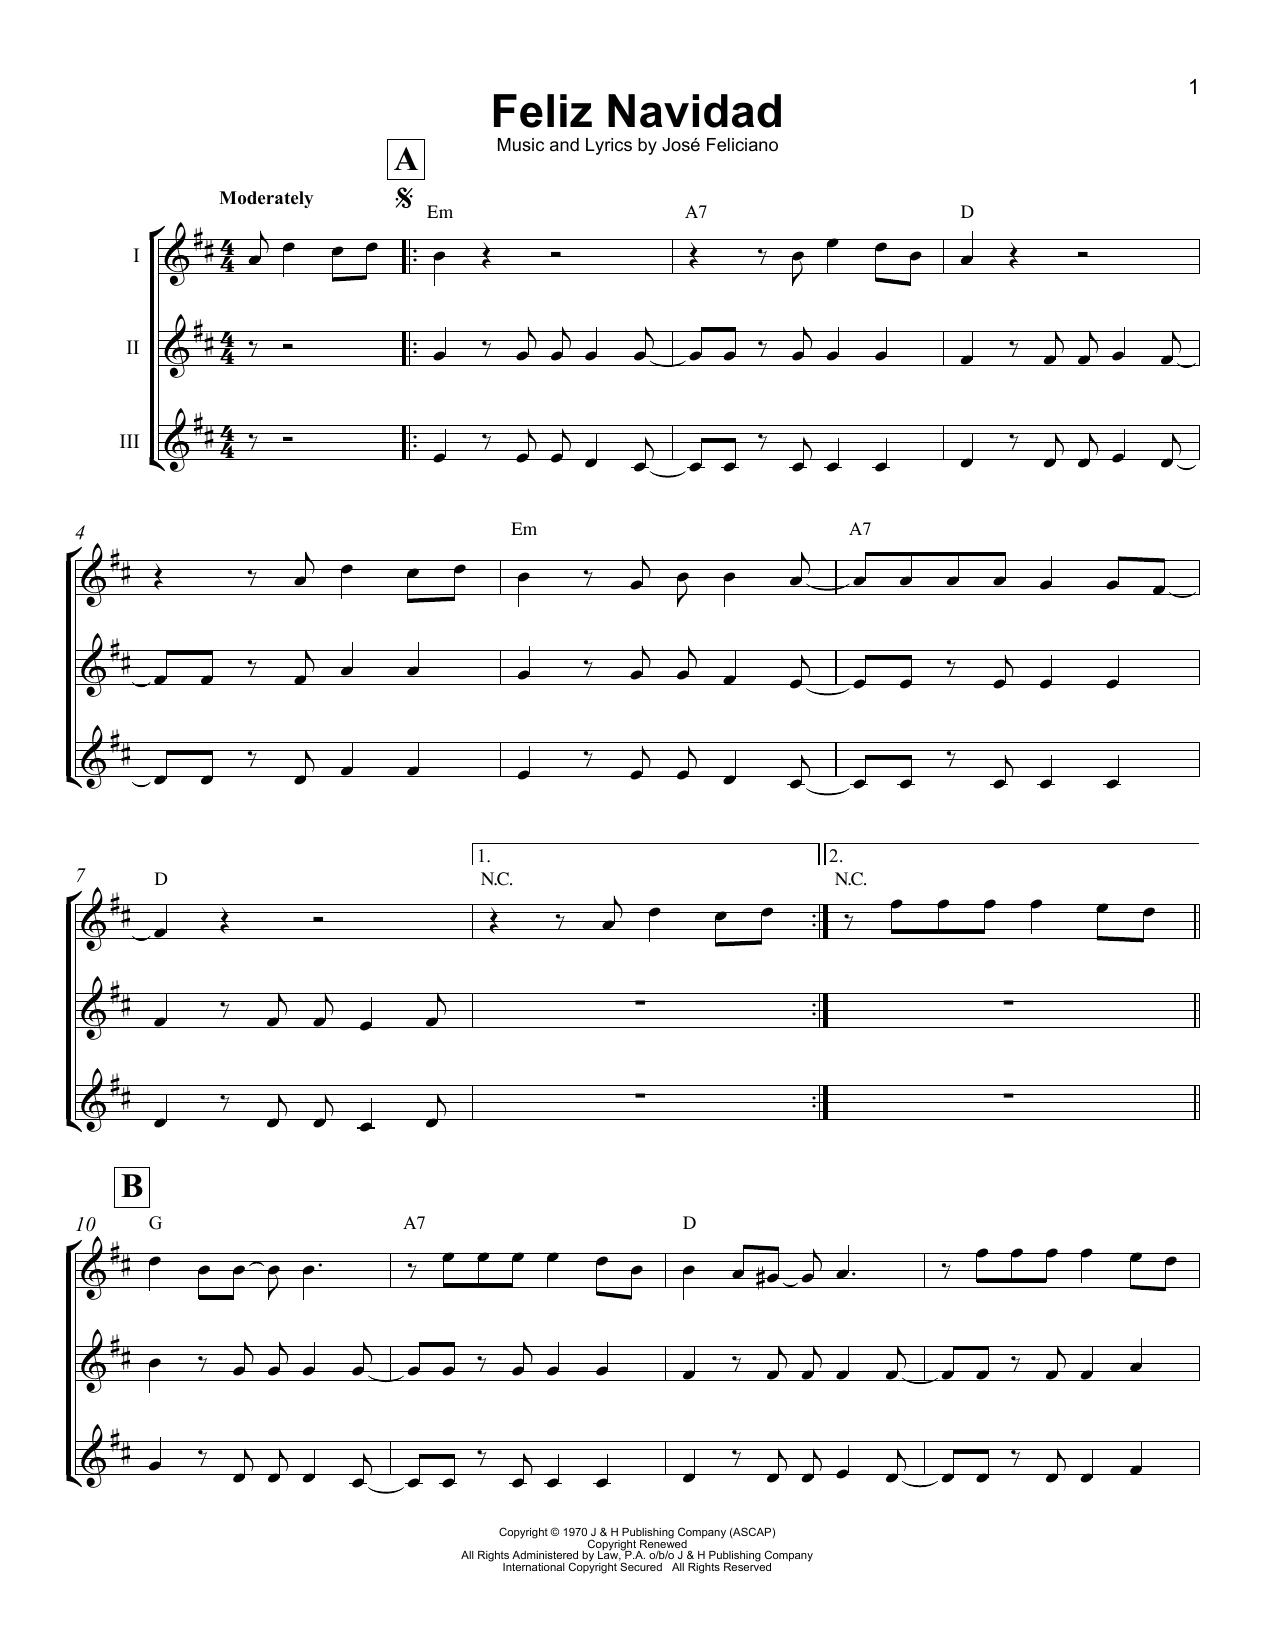 Feliz Navidad (Ukulele Ensemble) - Print Sheet Music Now